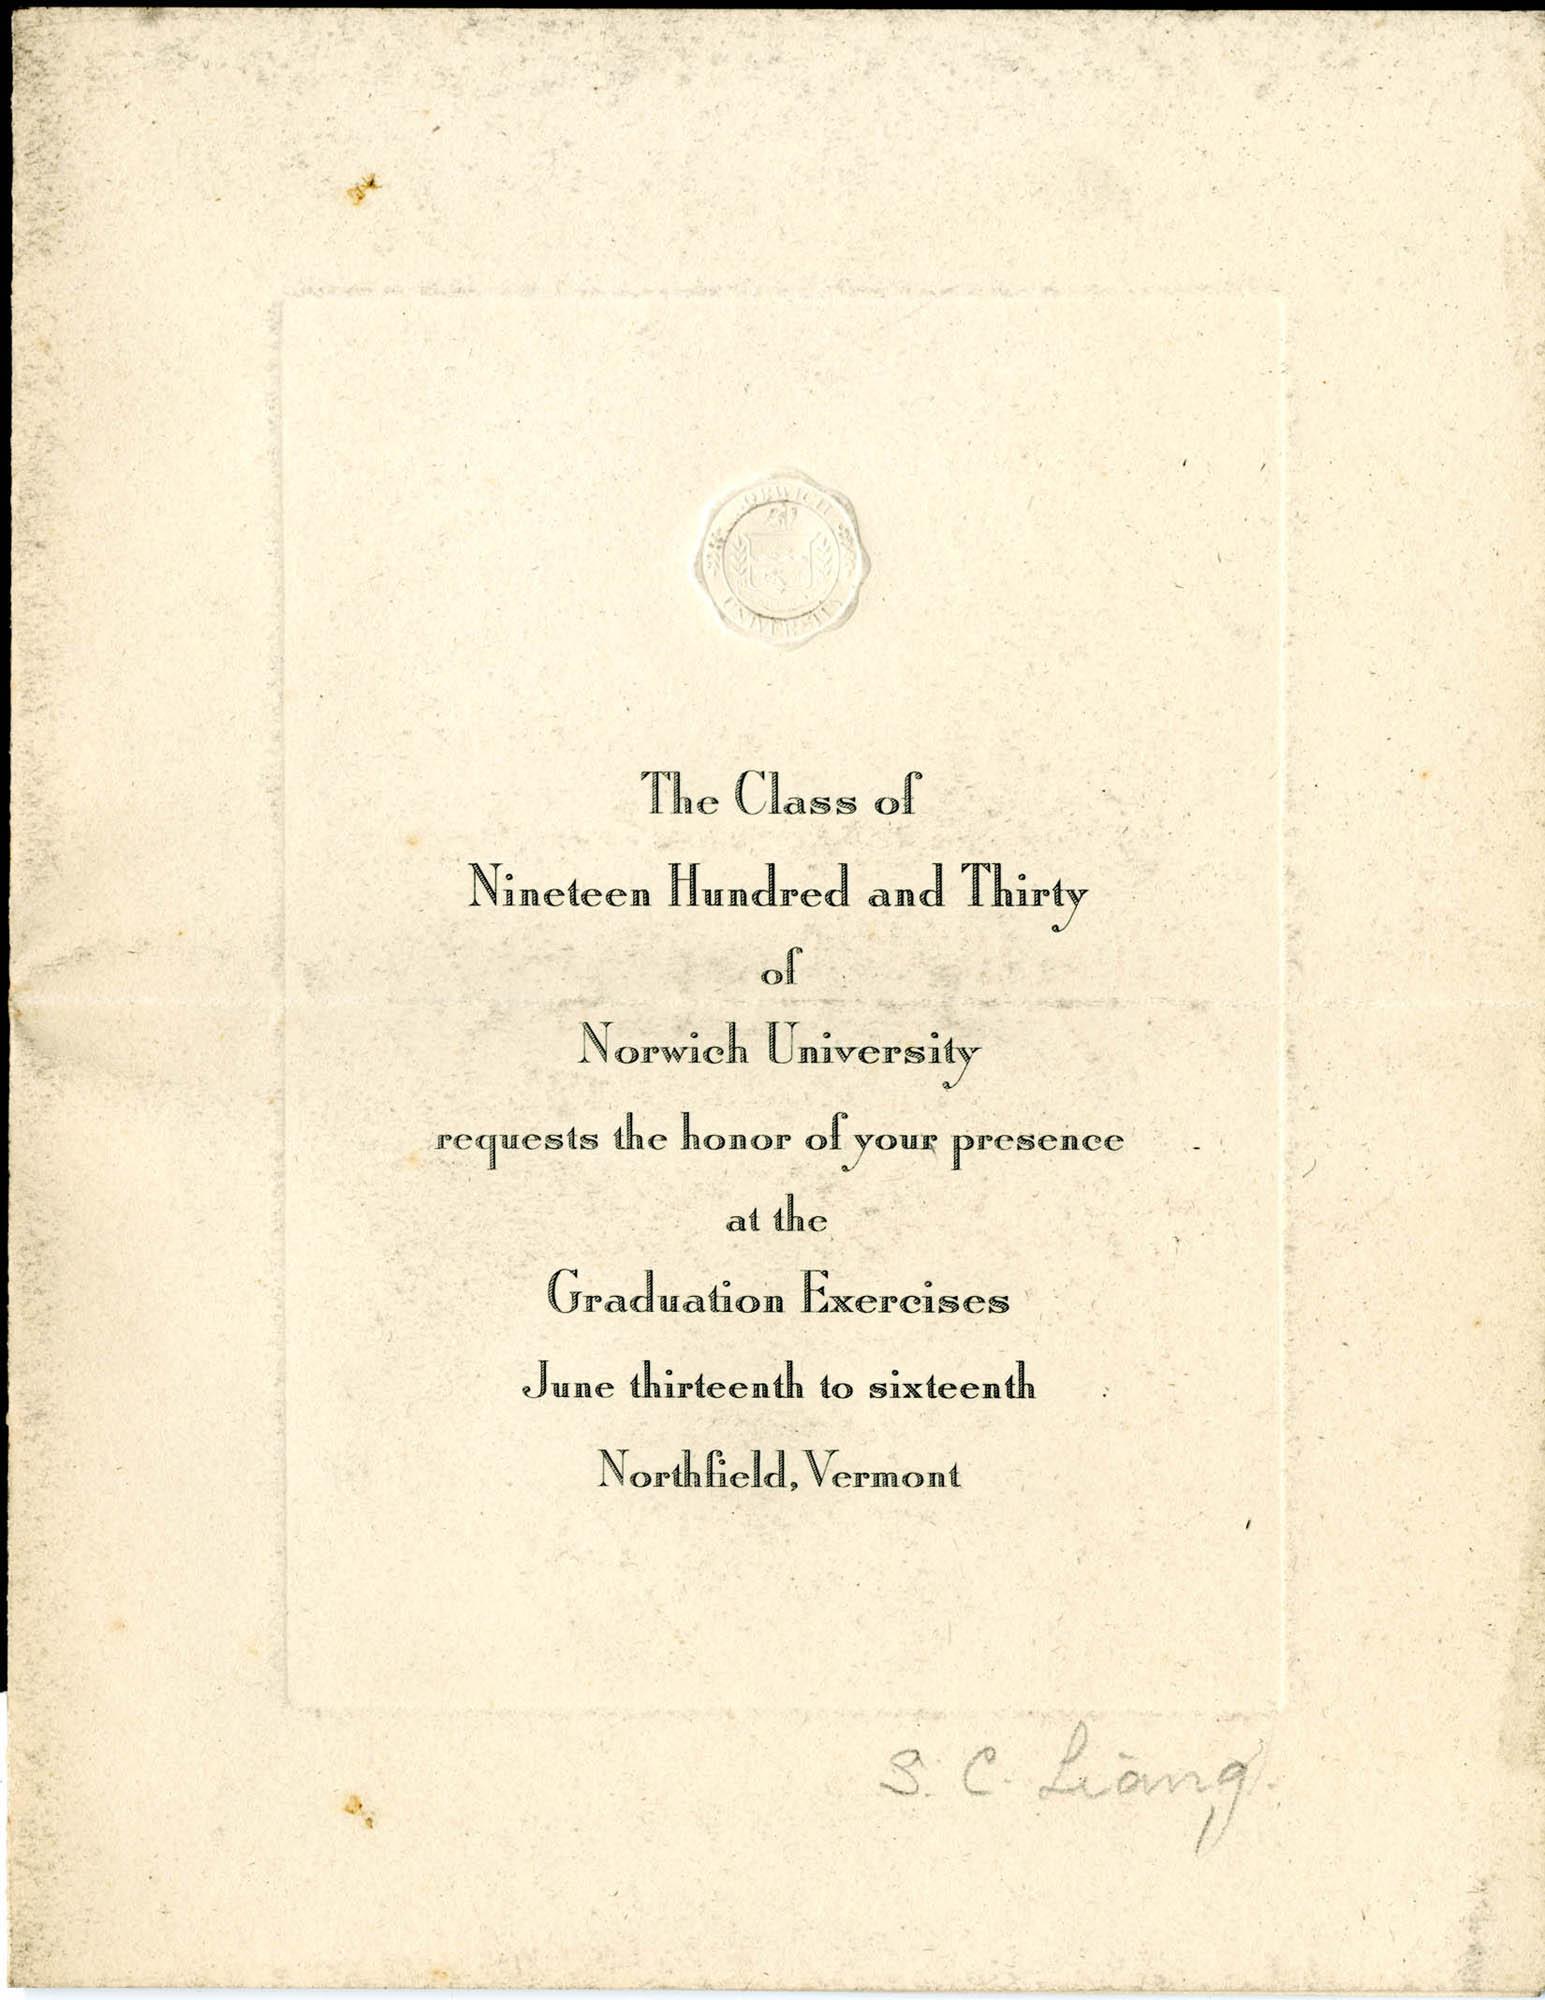 Photograph Album of Laura M. Bragg, Page 72a